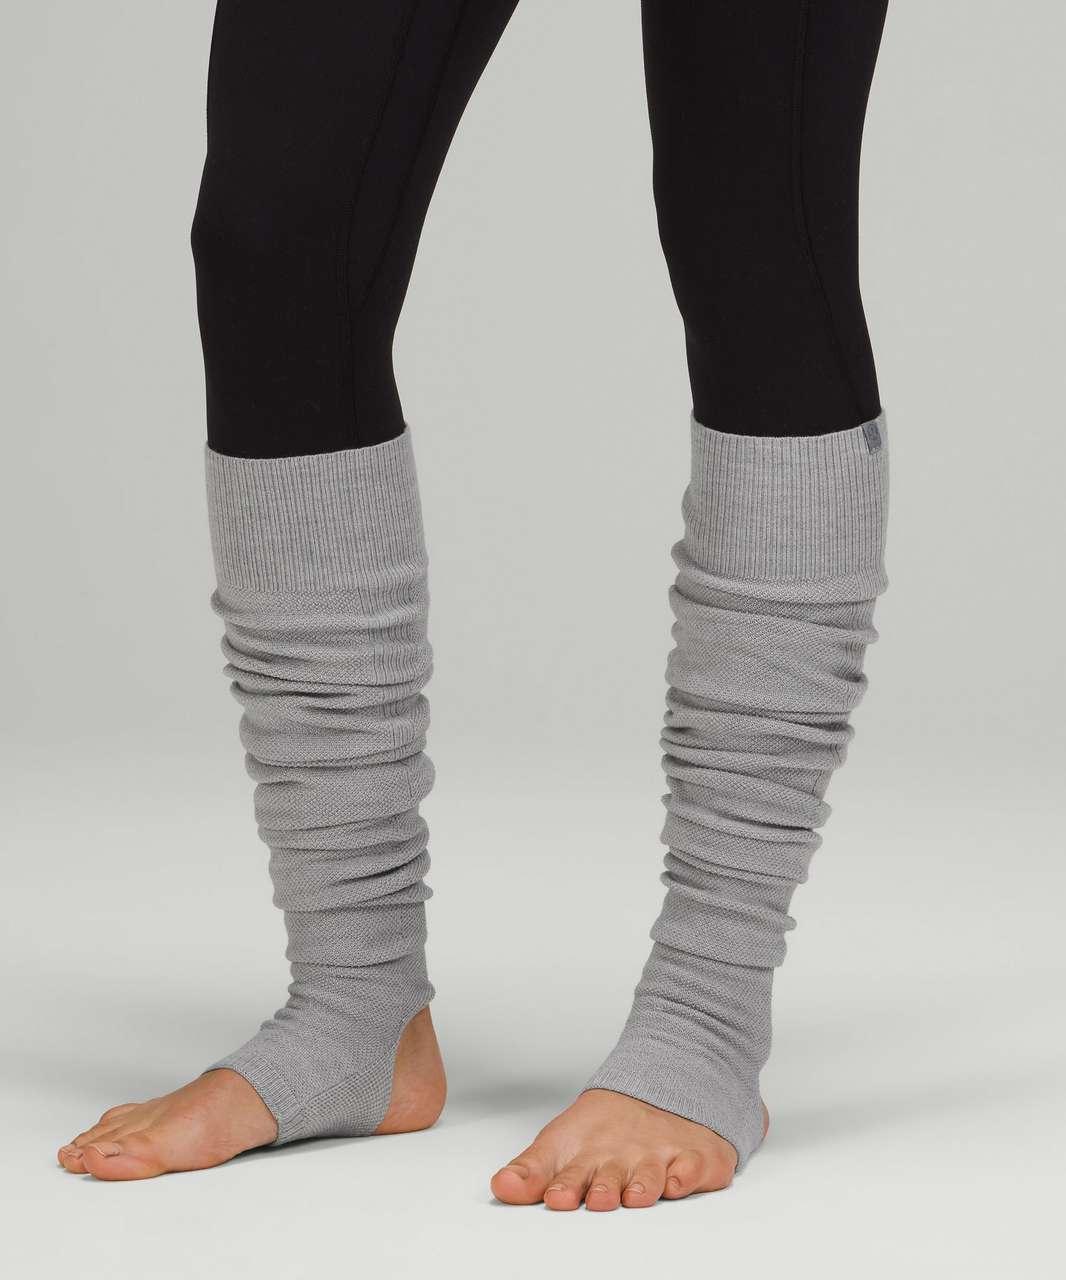 Lululemon Evolution Leg Warmer - Heathered Rhino Grey